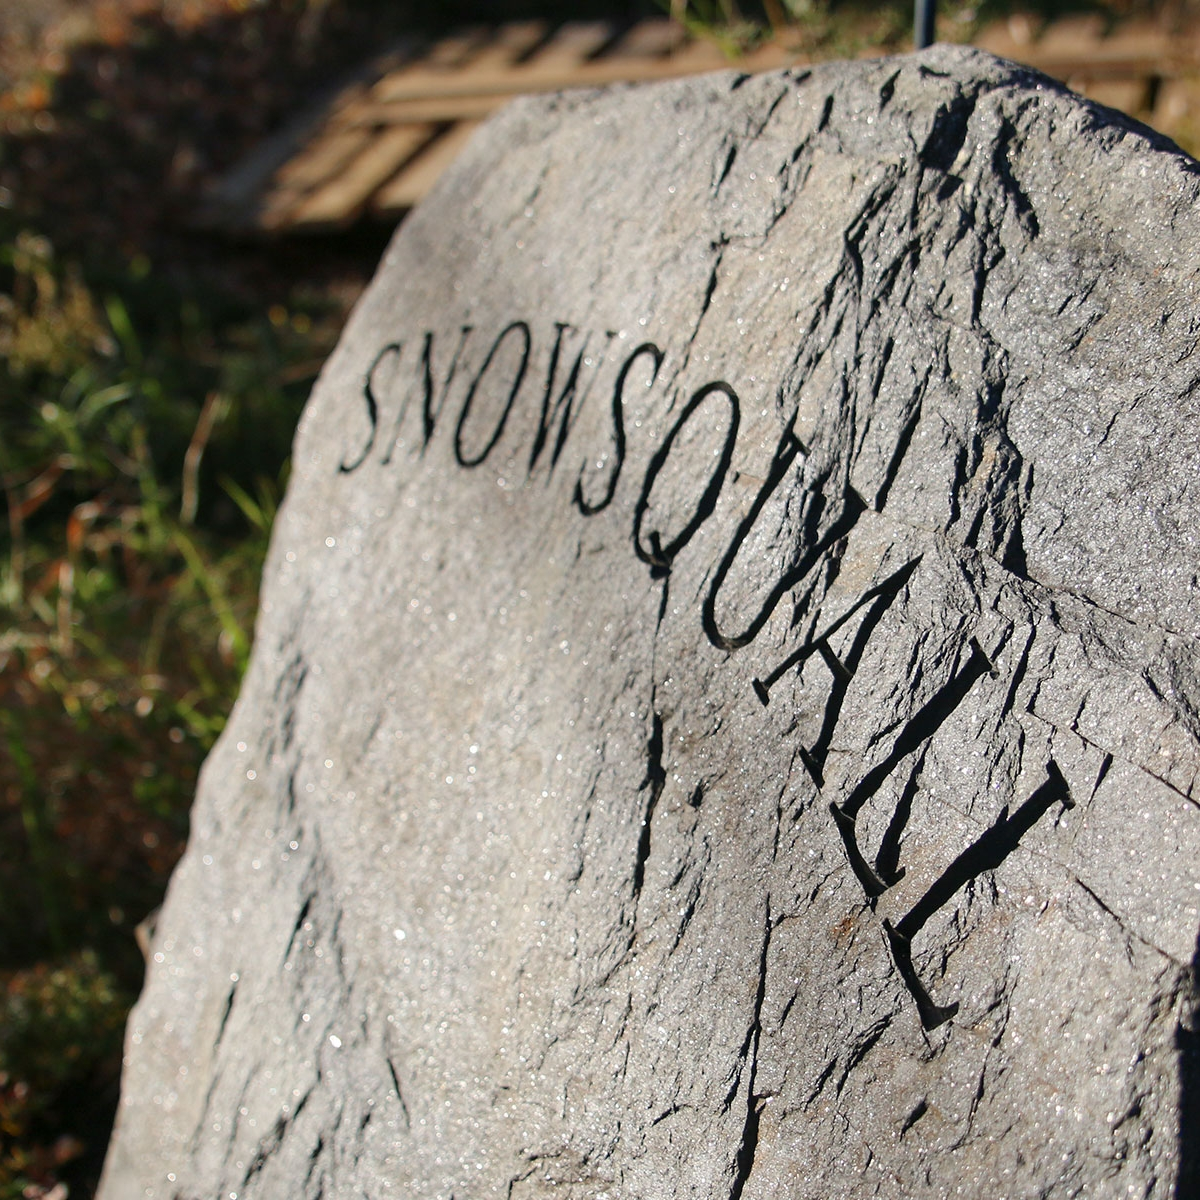 Snowsqall-rock_IMG_7647.jpg